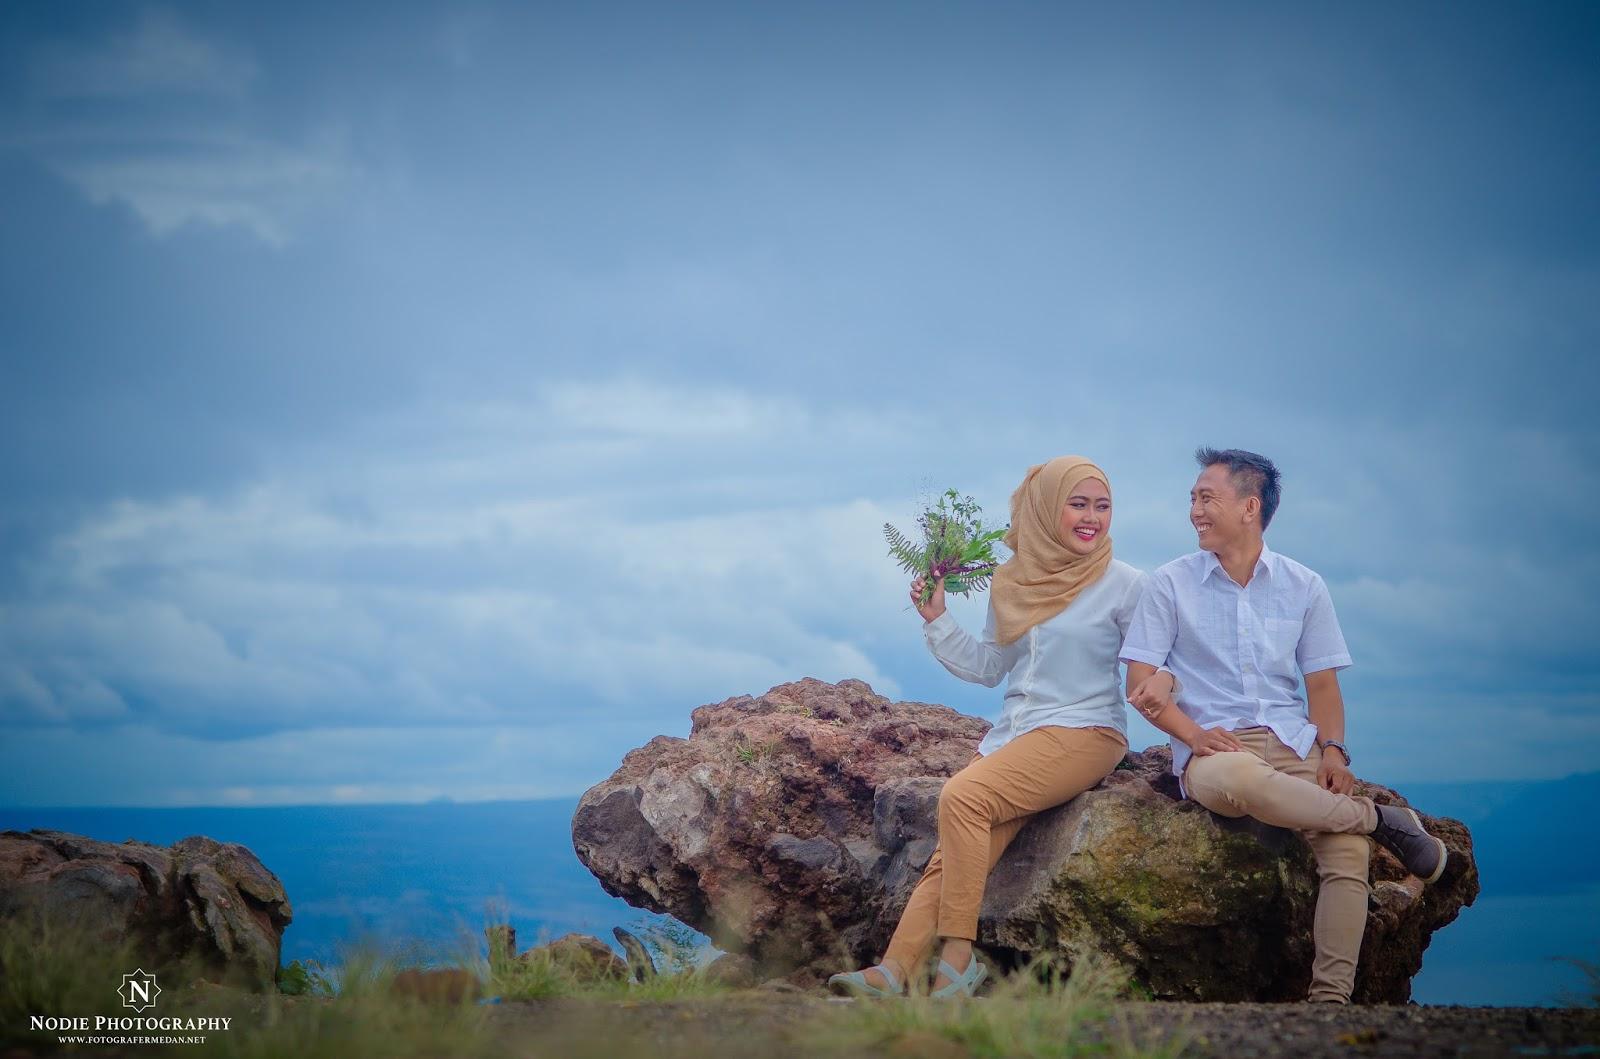 Foto Prewedding Jogja Dengan Lokasi Alam Dan Pegunungan: Prawedding Murah Di Medan